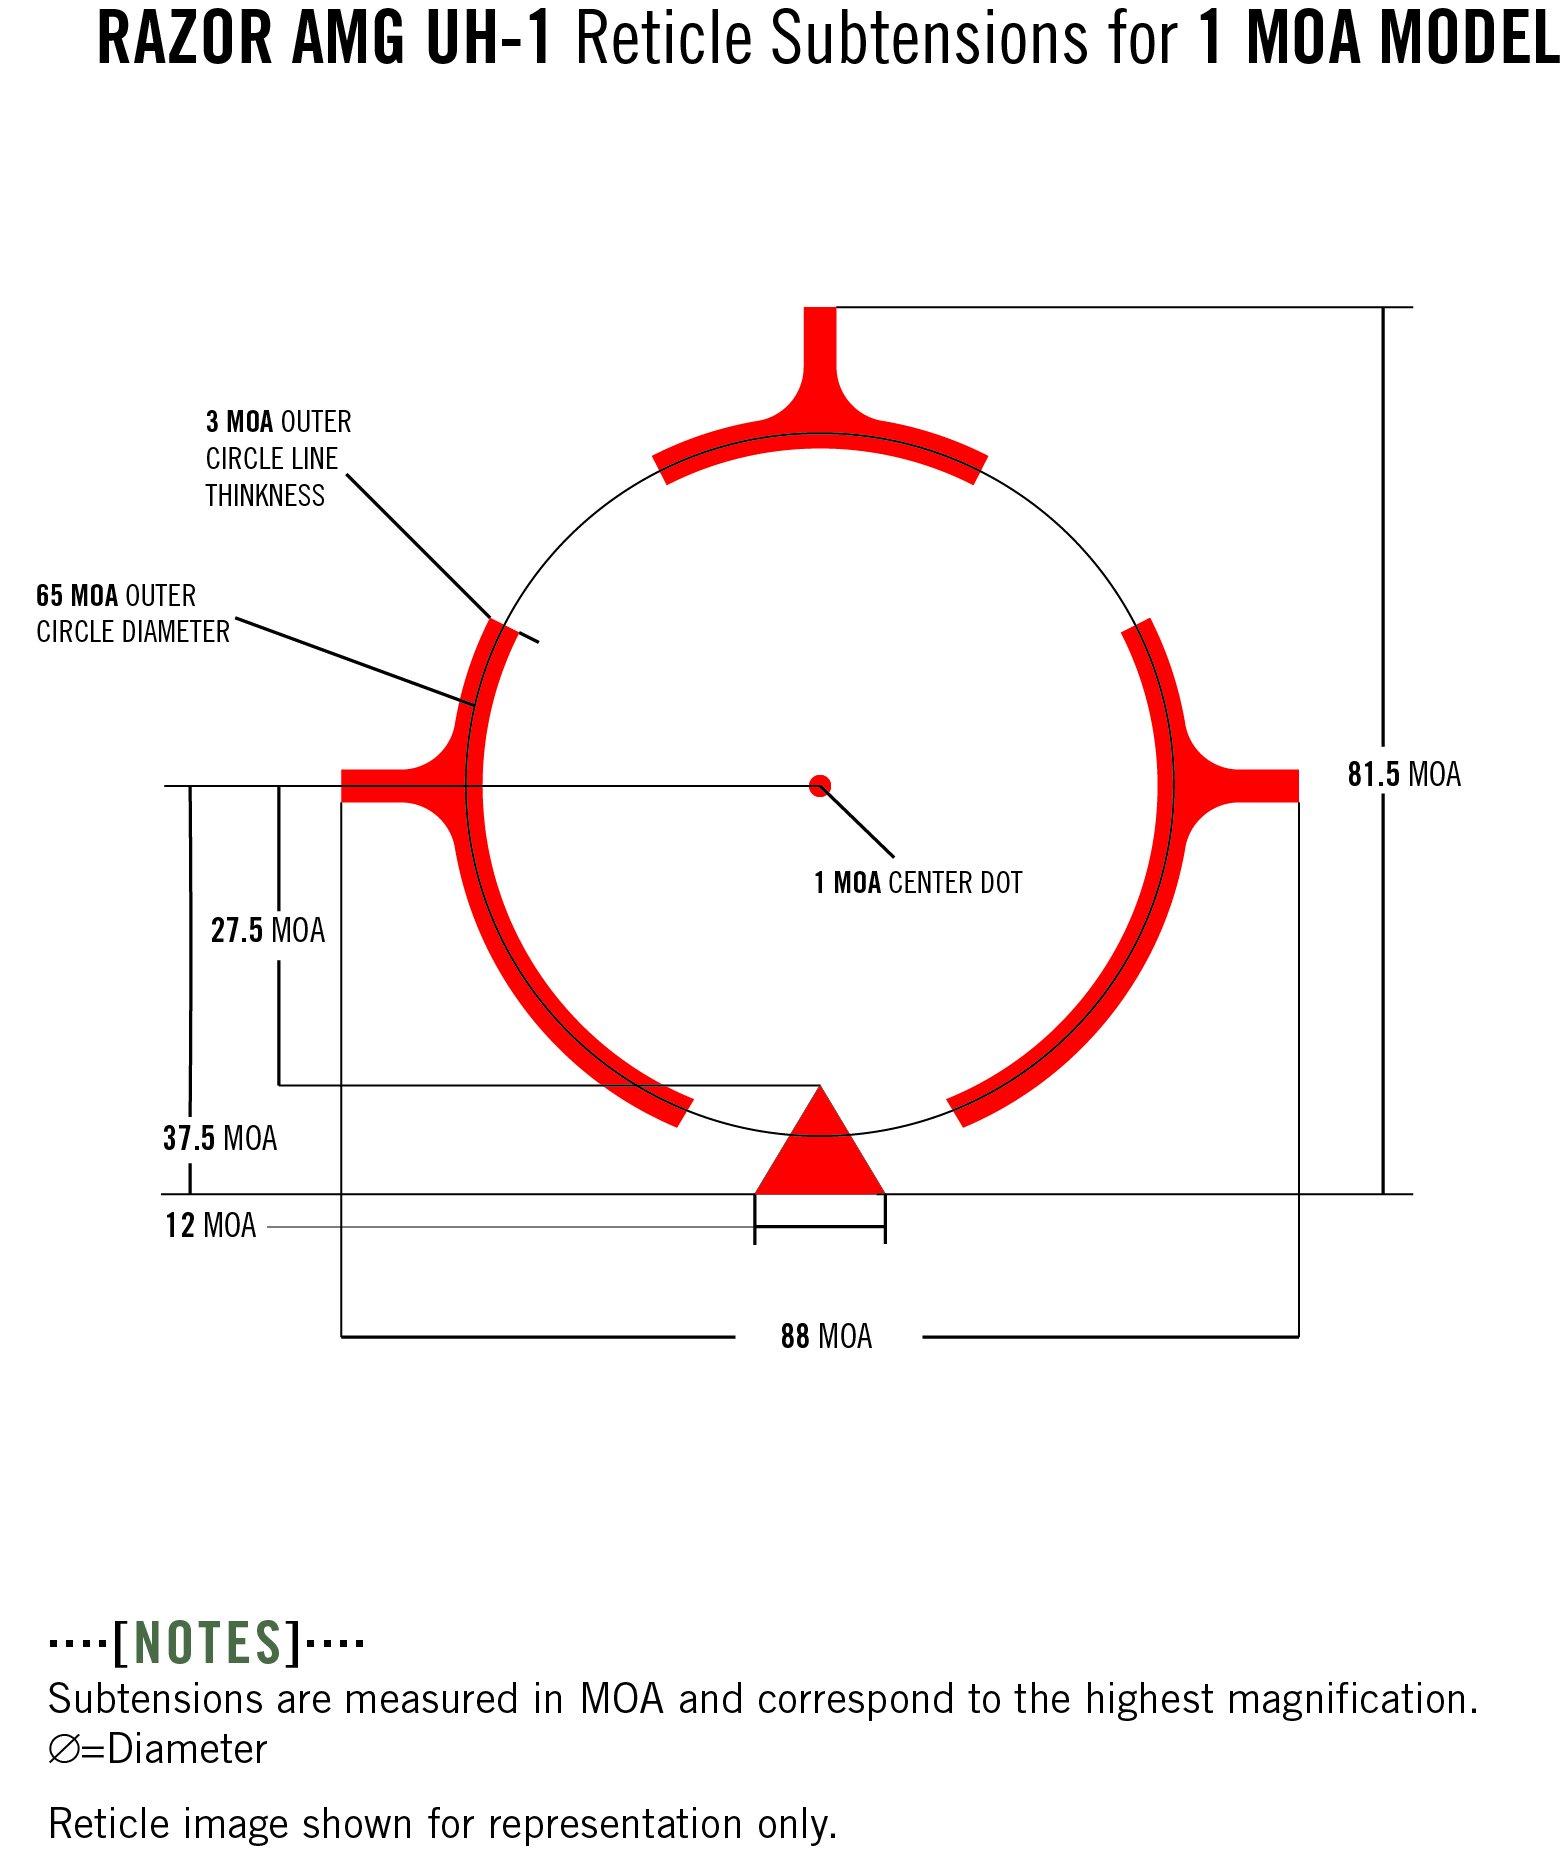 Vortex Razor AMG UH-1 Holographic Red Dot Reflex Sight 1 MOA - Australian Tactical Precision